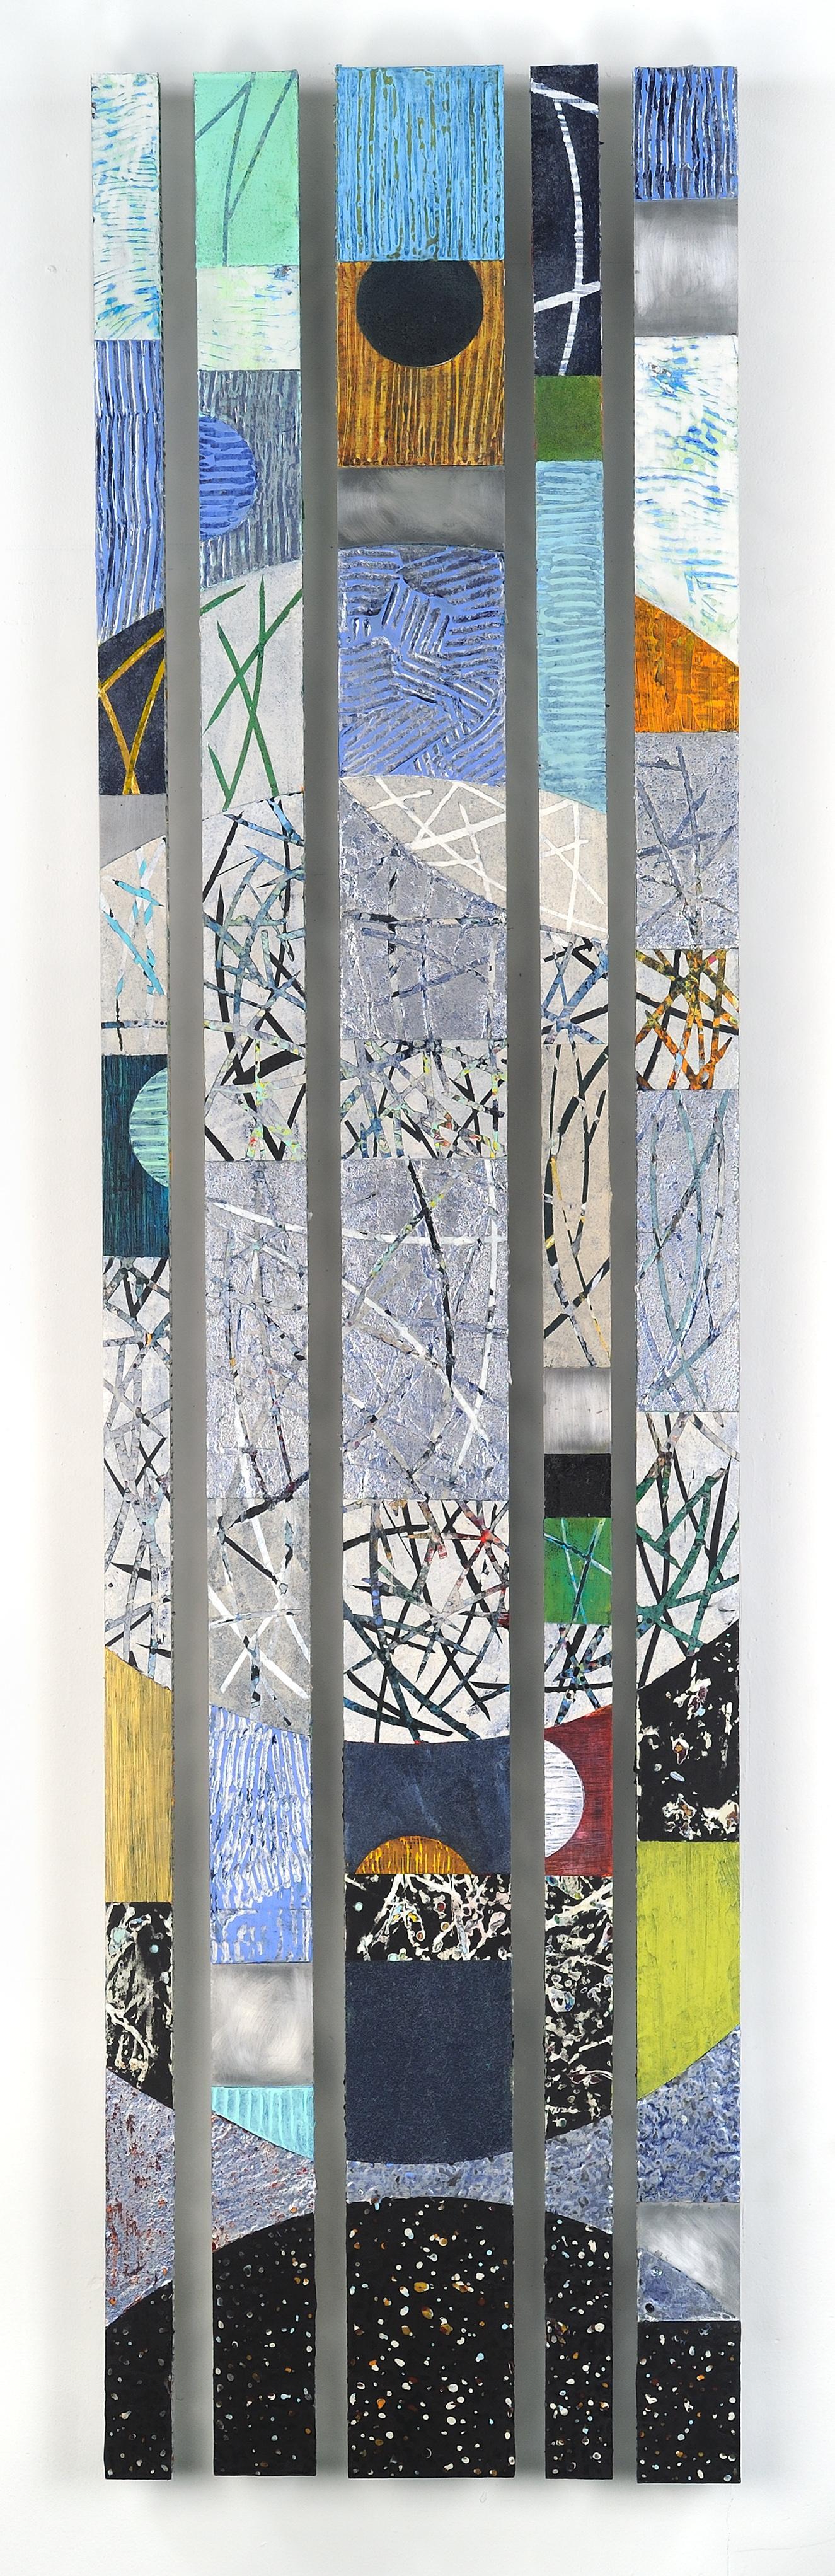 Strata 20-1, multicolored mixed media sculptural piece on aluminum